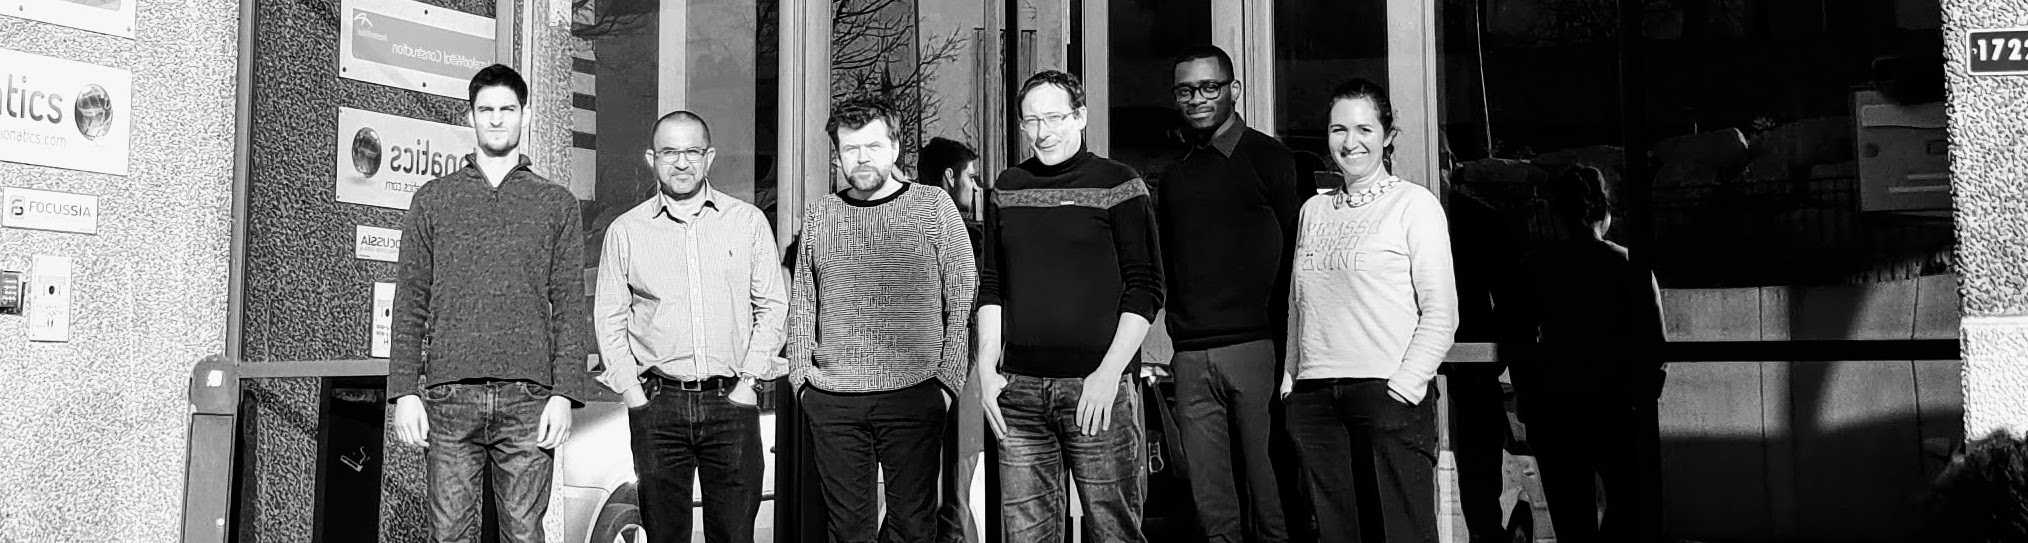 Focussia team of smart manufacturing experts